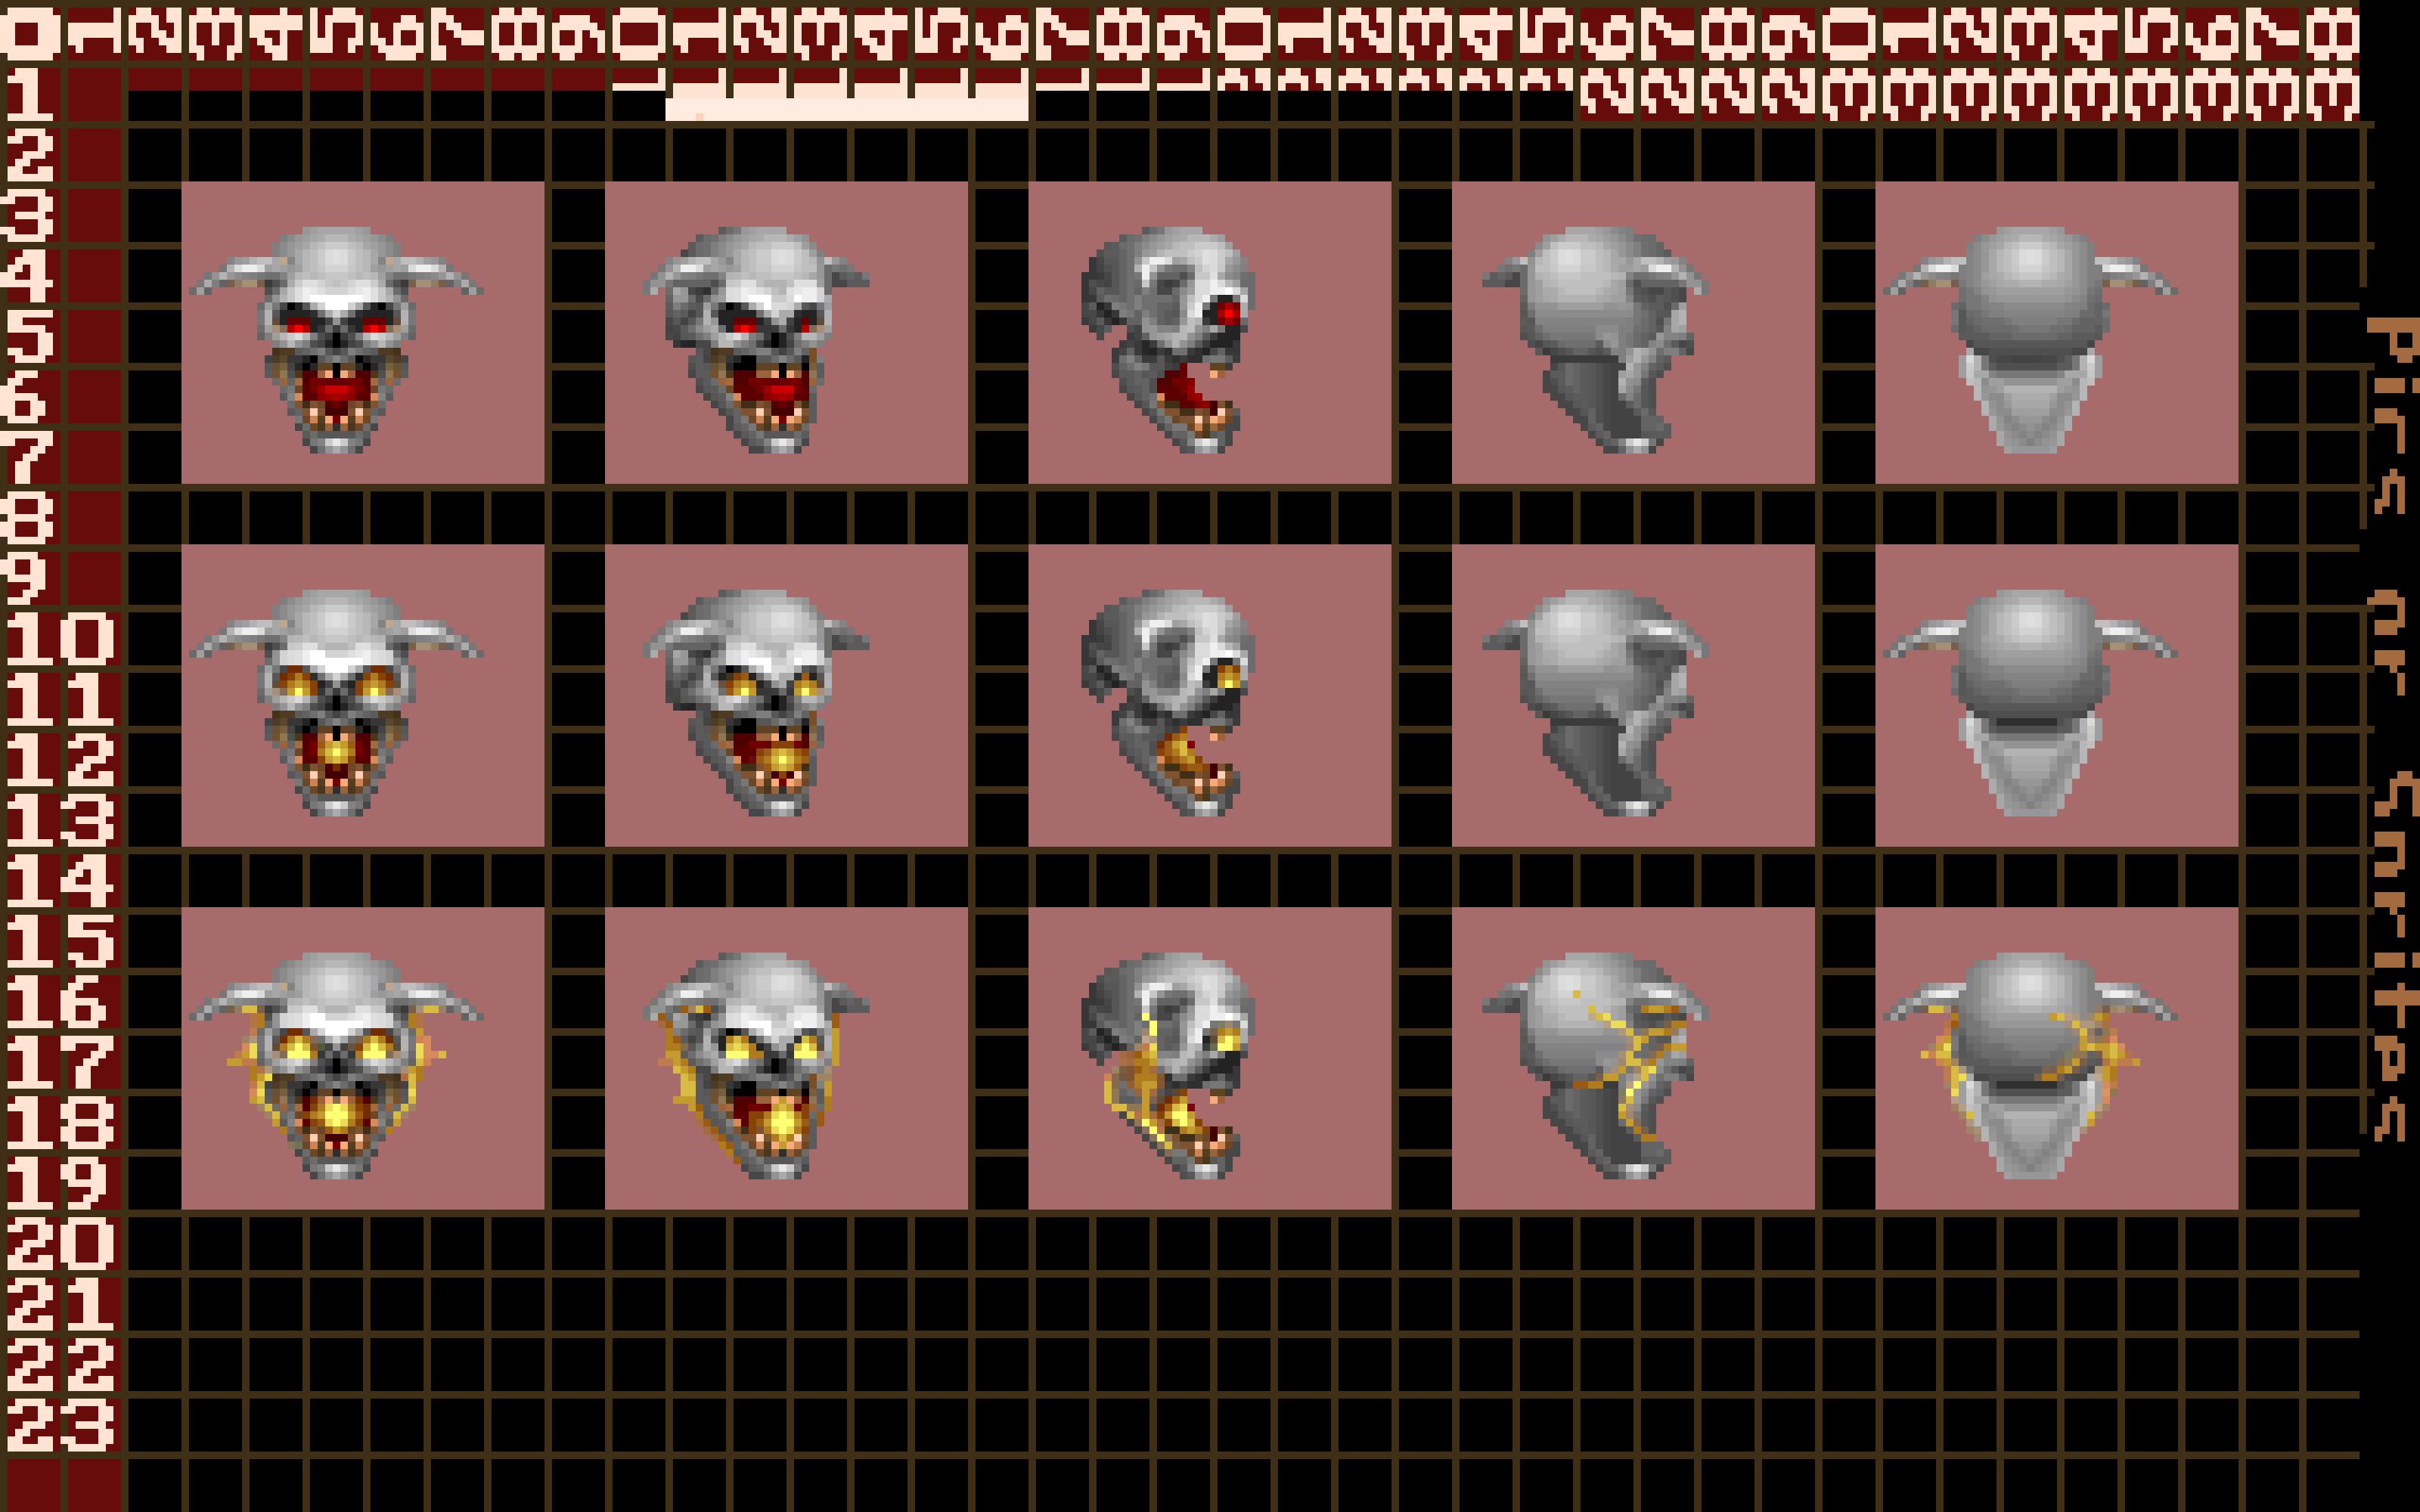 skull1_1.png